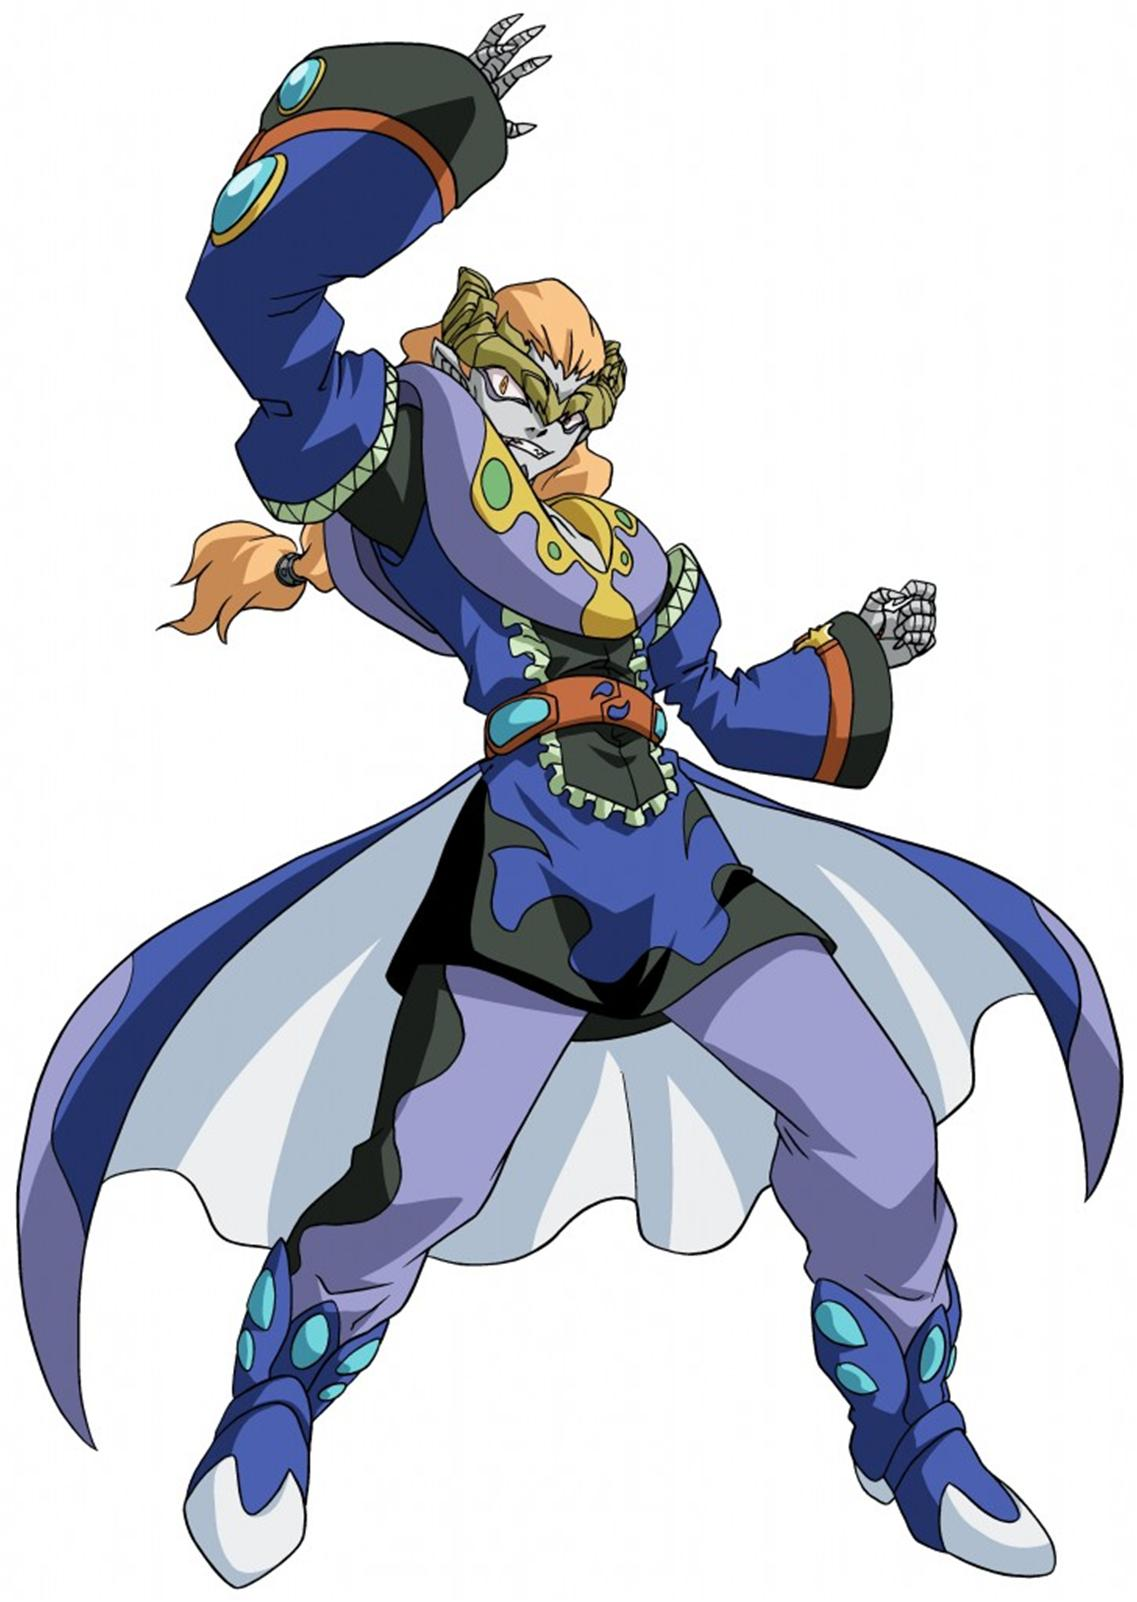 bakugan gundalian invaders zerochan anime image board